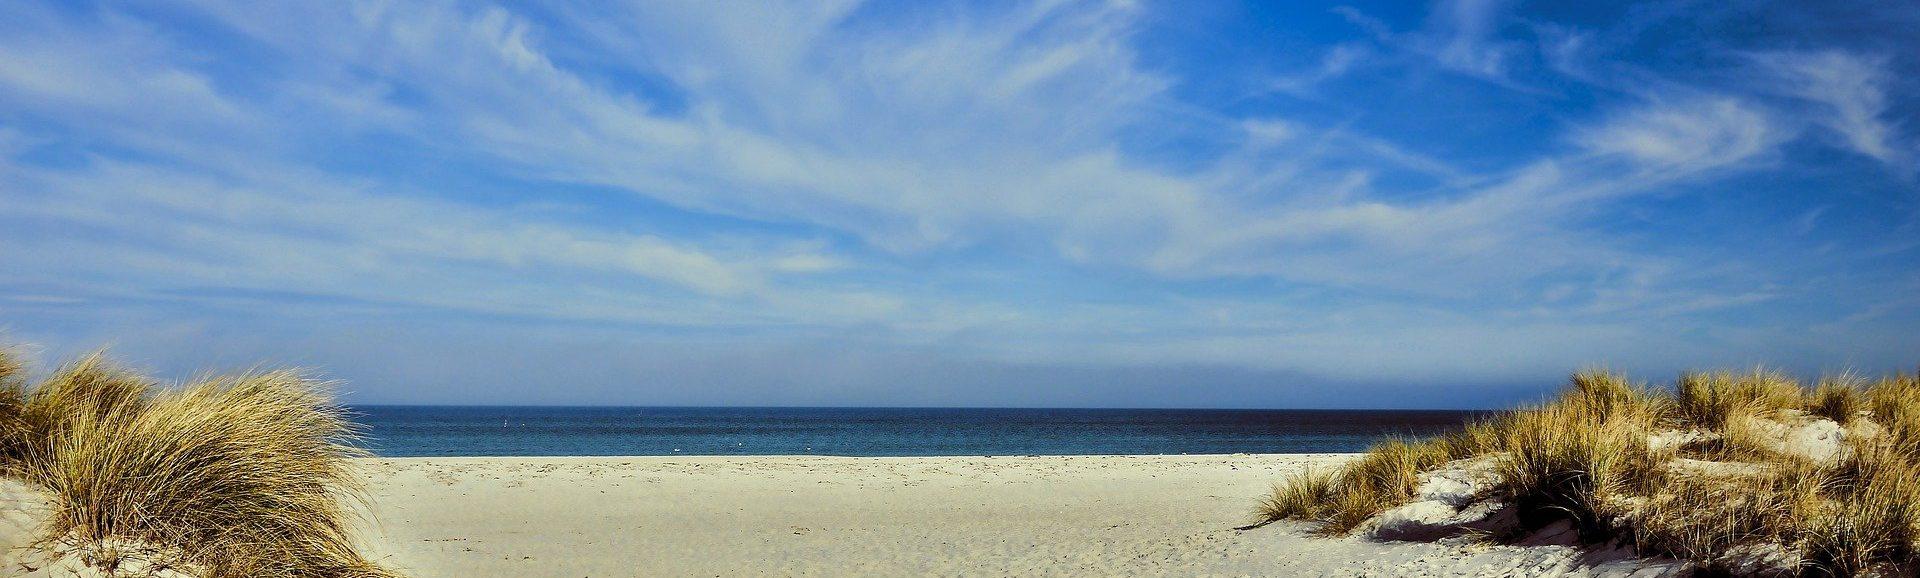 dune landscape 4886912 1920